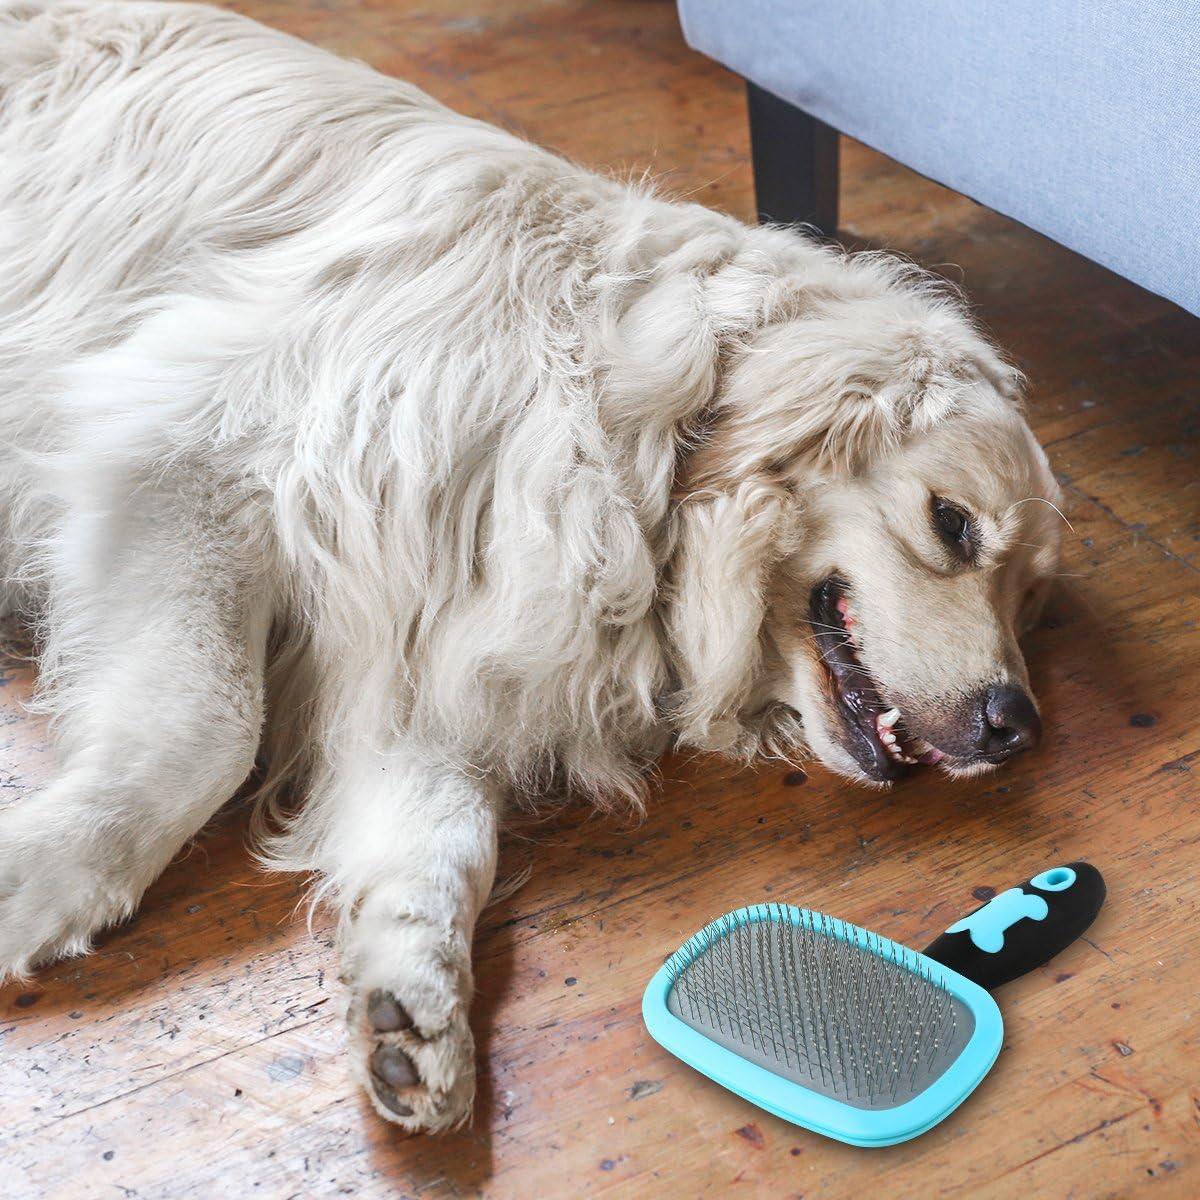 Buy Glendan Slicker brush from Amazon for Treeing Walker Coonhound